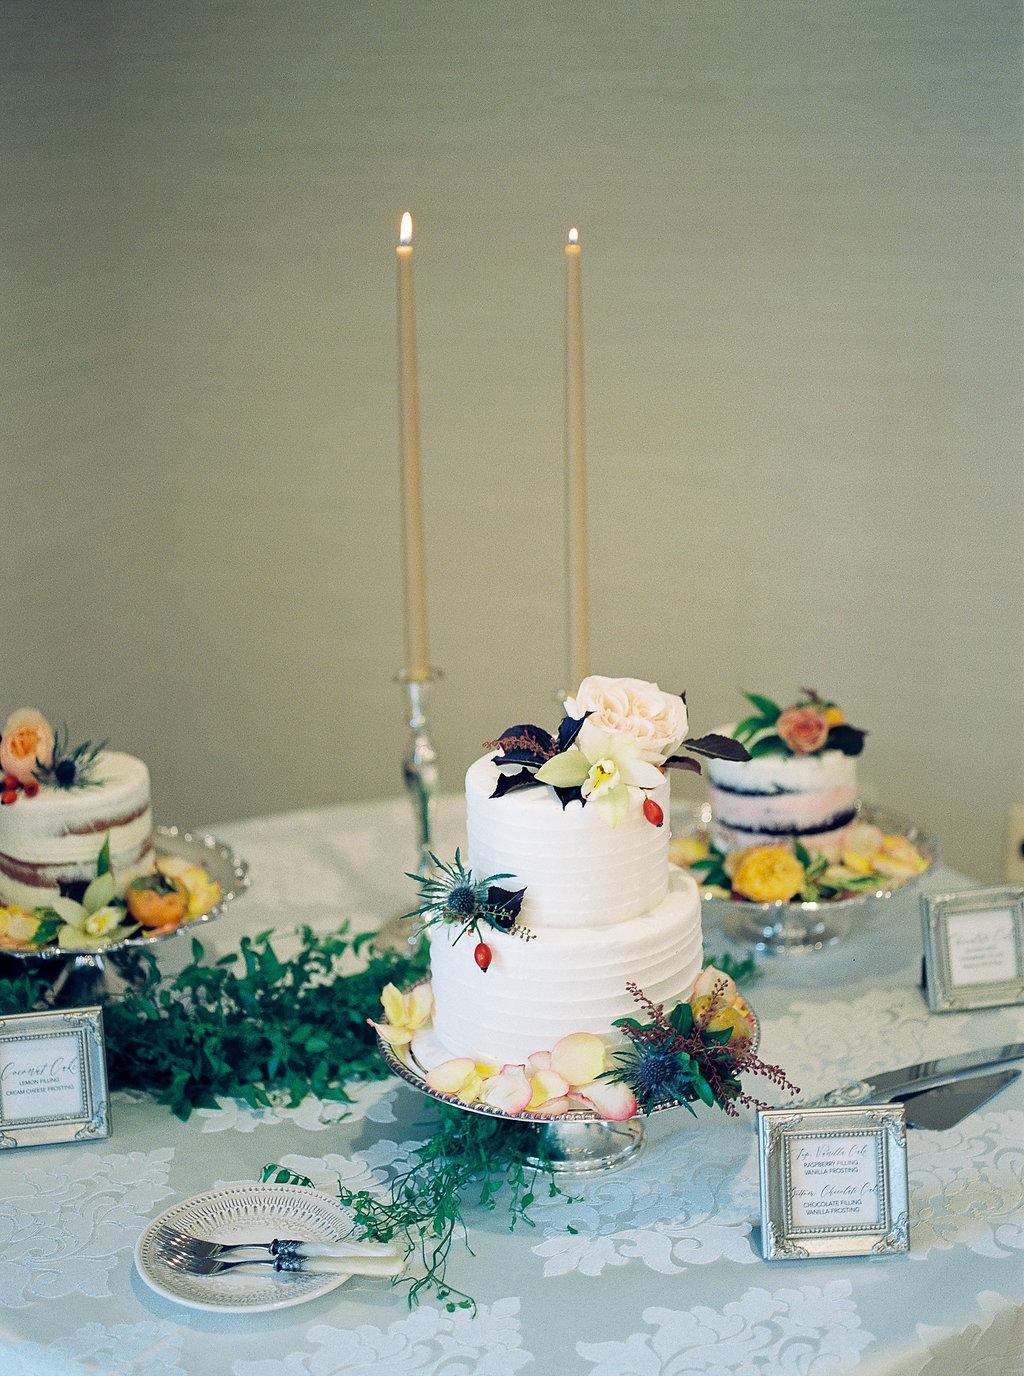 Alexandra-Elise-Photography-Ali-Reed-Nicole-Derek-Bristol-Harbour-Wedding-Reception-093.jpg